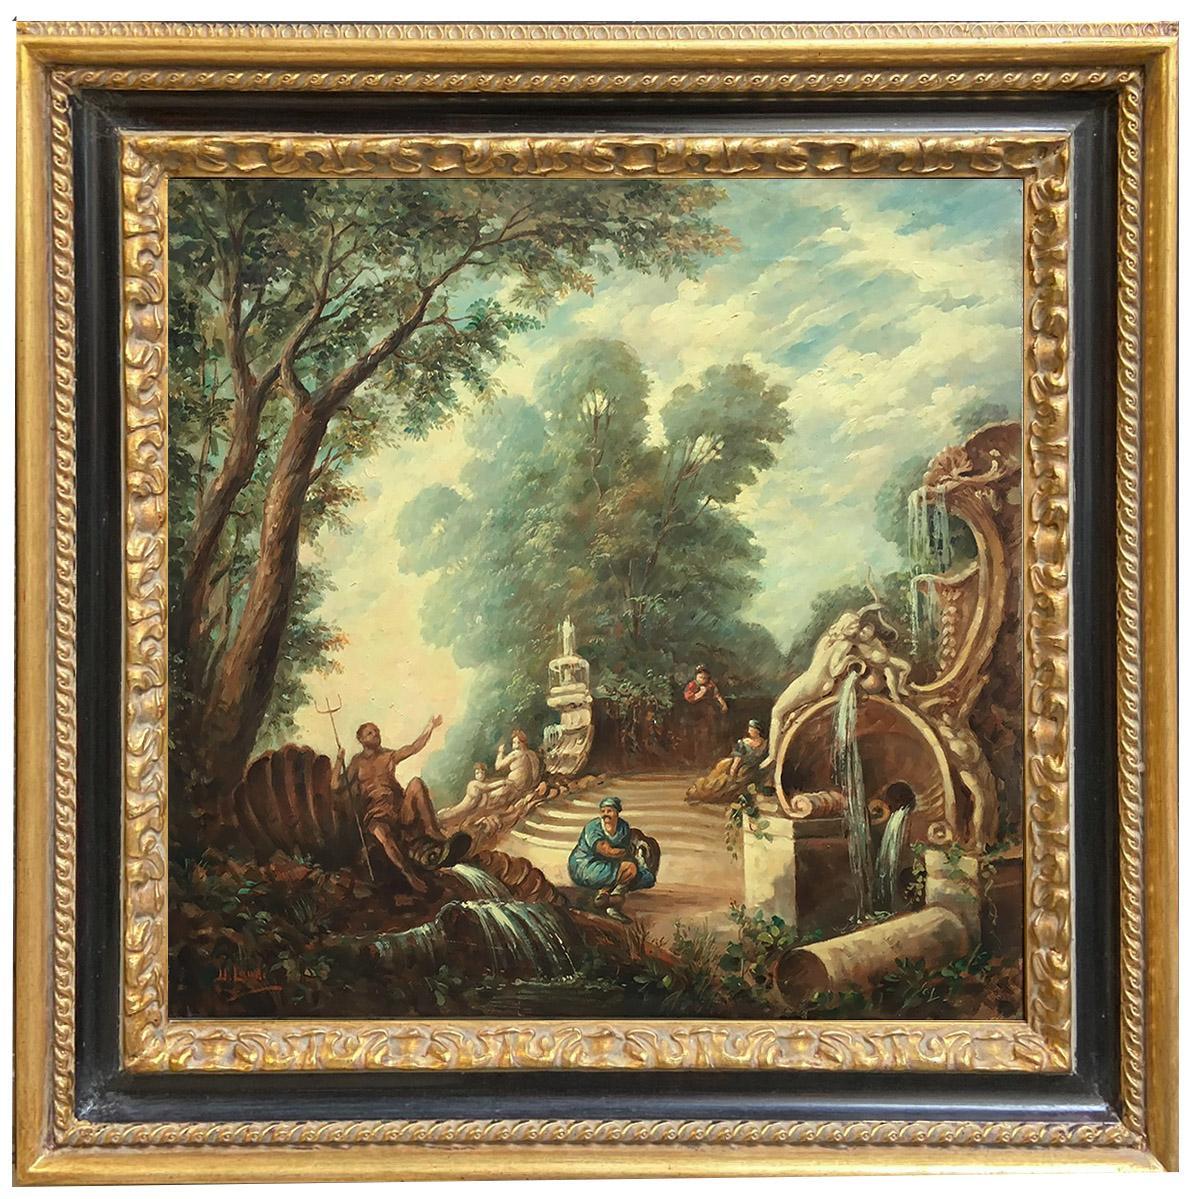 CAPRICCI LANDESCAPE -Roman School - Italian Oil on Canvas Painting